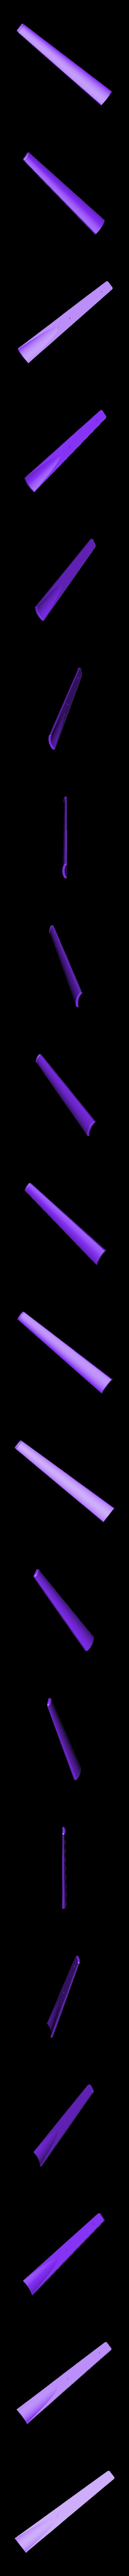 11-fingerboard-print.stl Download free STL file Violin • 3D print design, jteix